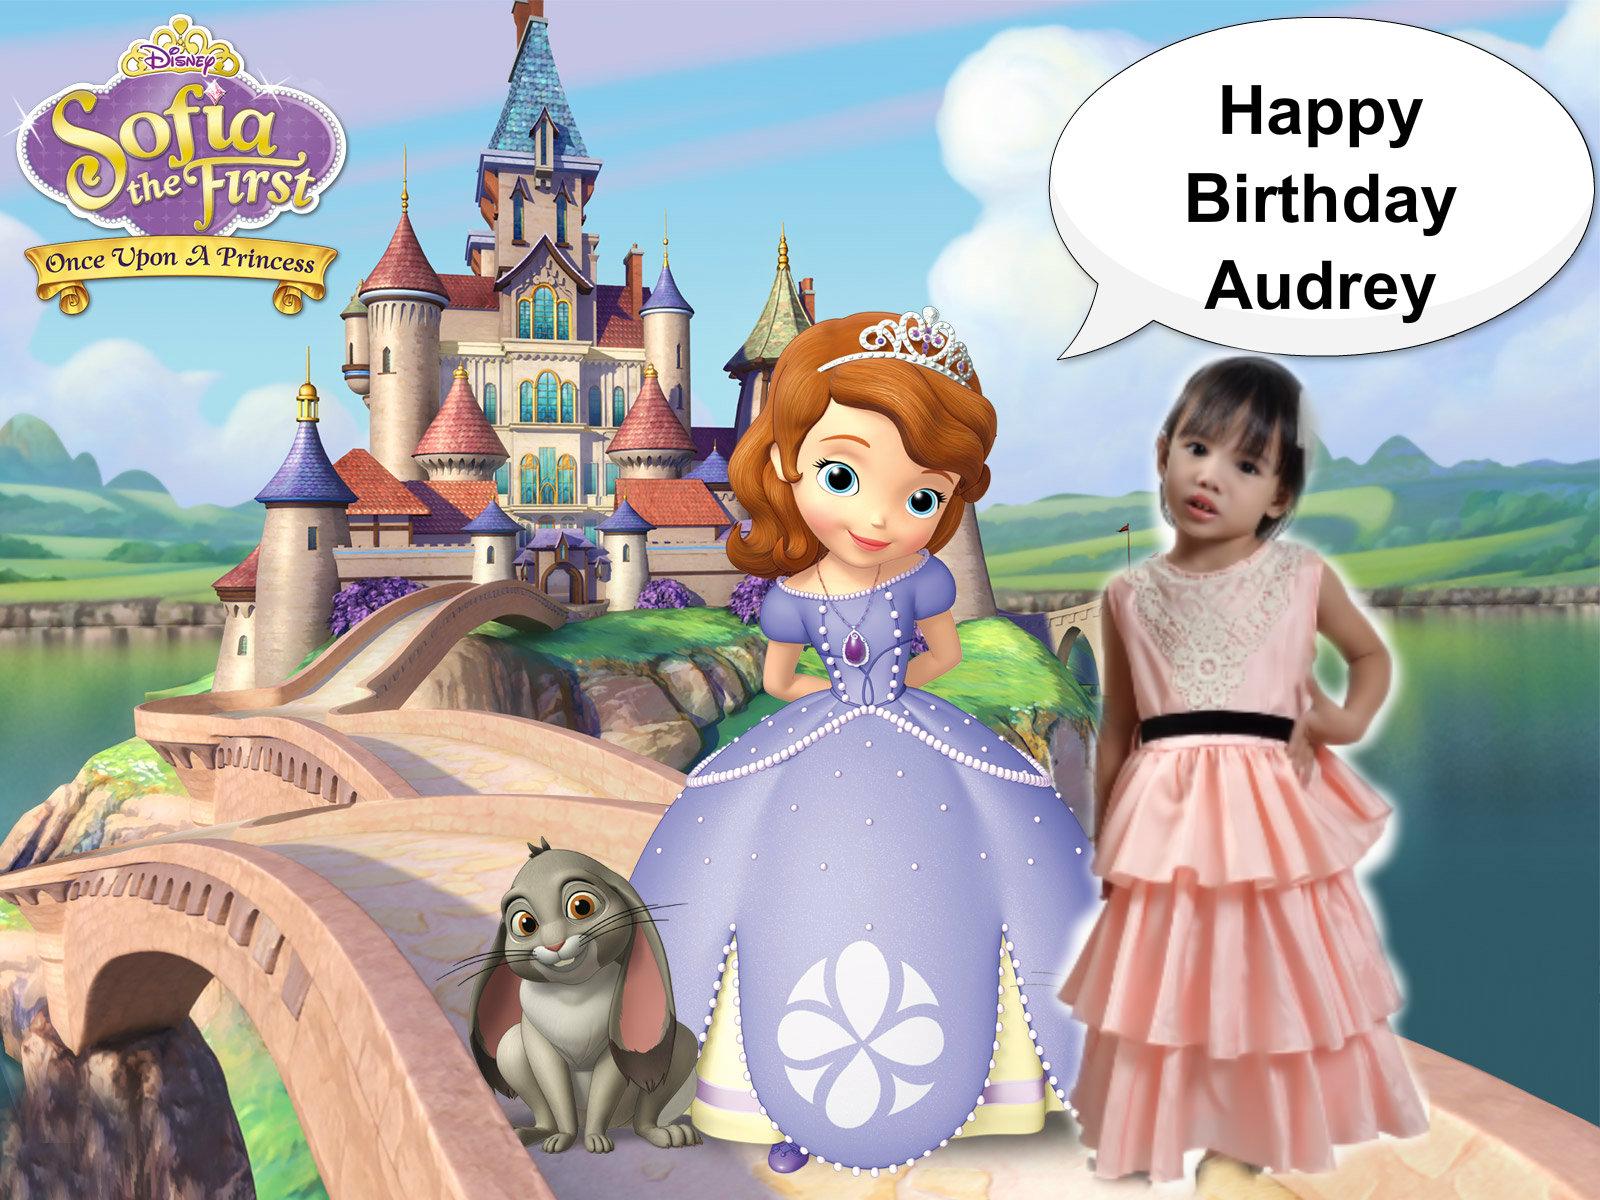 Happy Birthday Audrey Sofia The First Fan Art 36291691